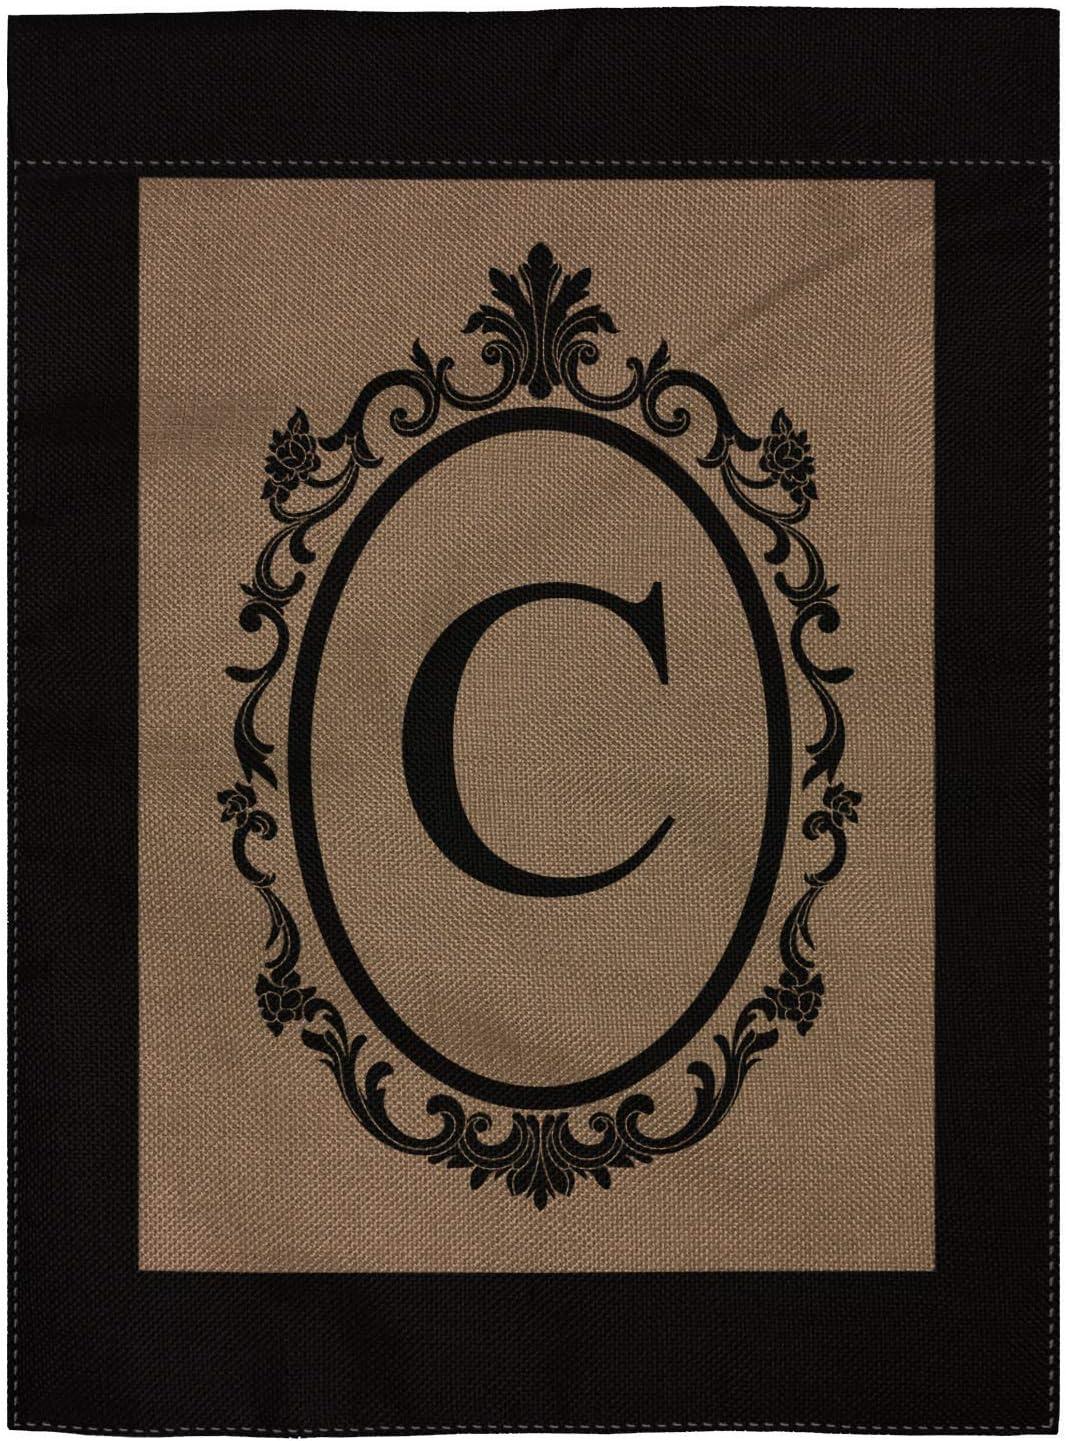 "pingpi Monogram C Burlap Double Sided Garden Flag - 18"" H x 12.5"" W"